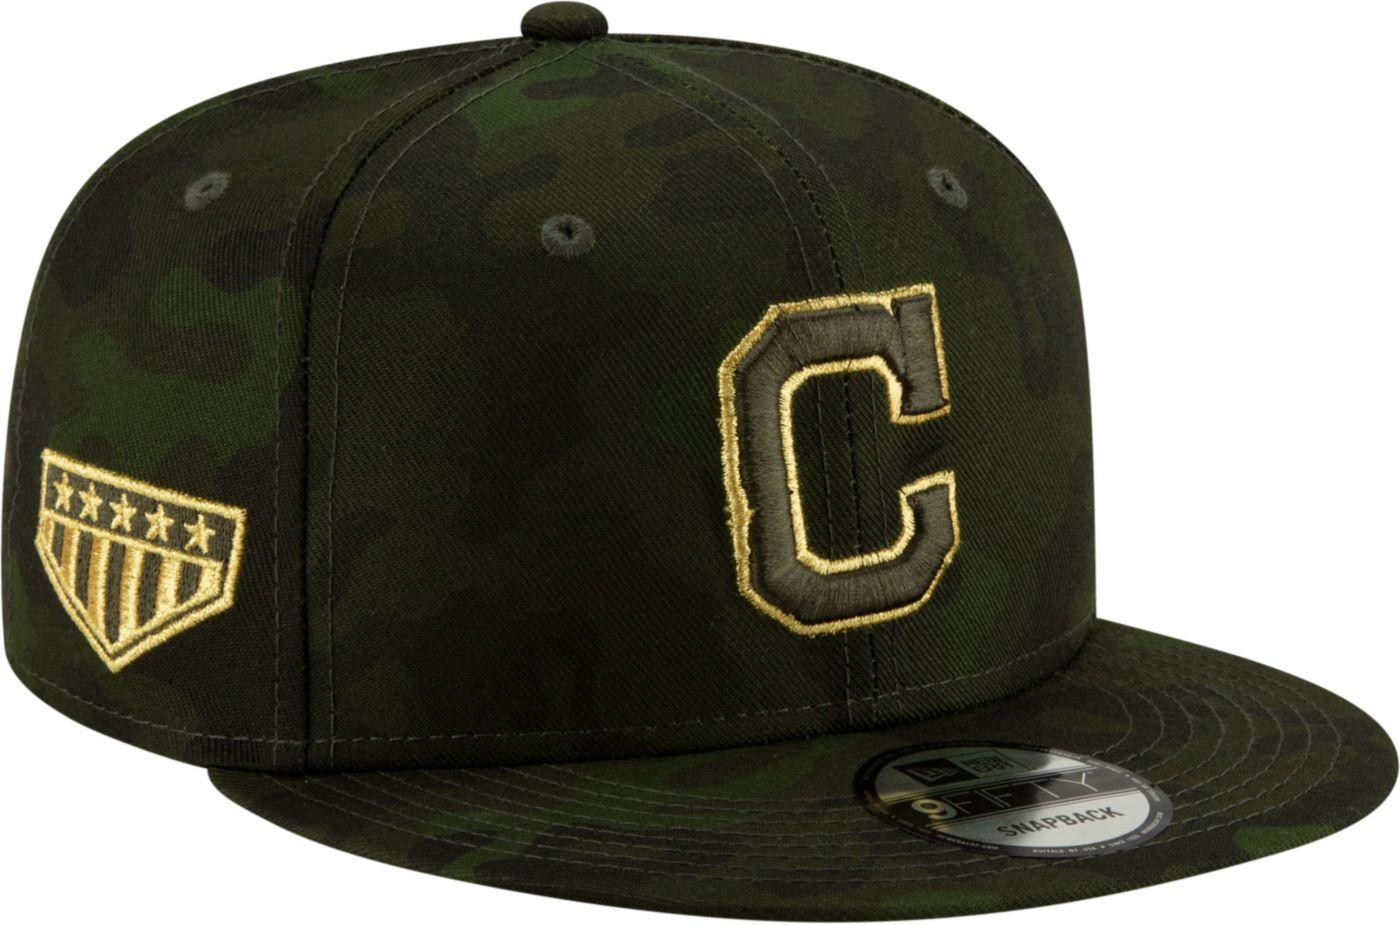 New Era Men's Cleveland Indians 9Fifty Armed Forces Adjustable Snapback Hat